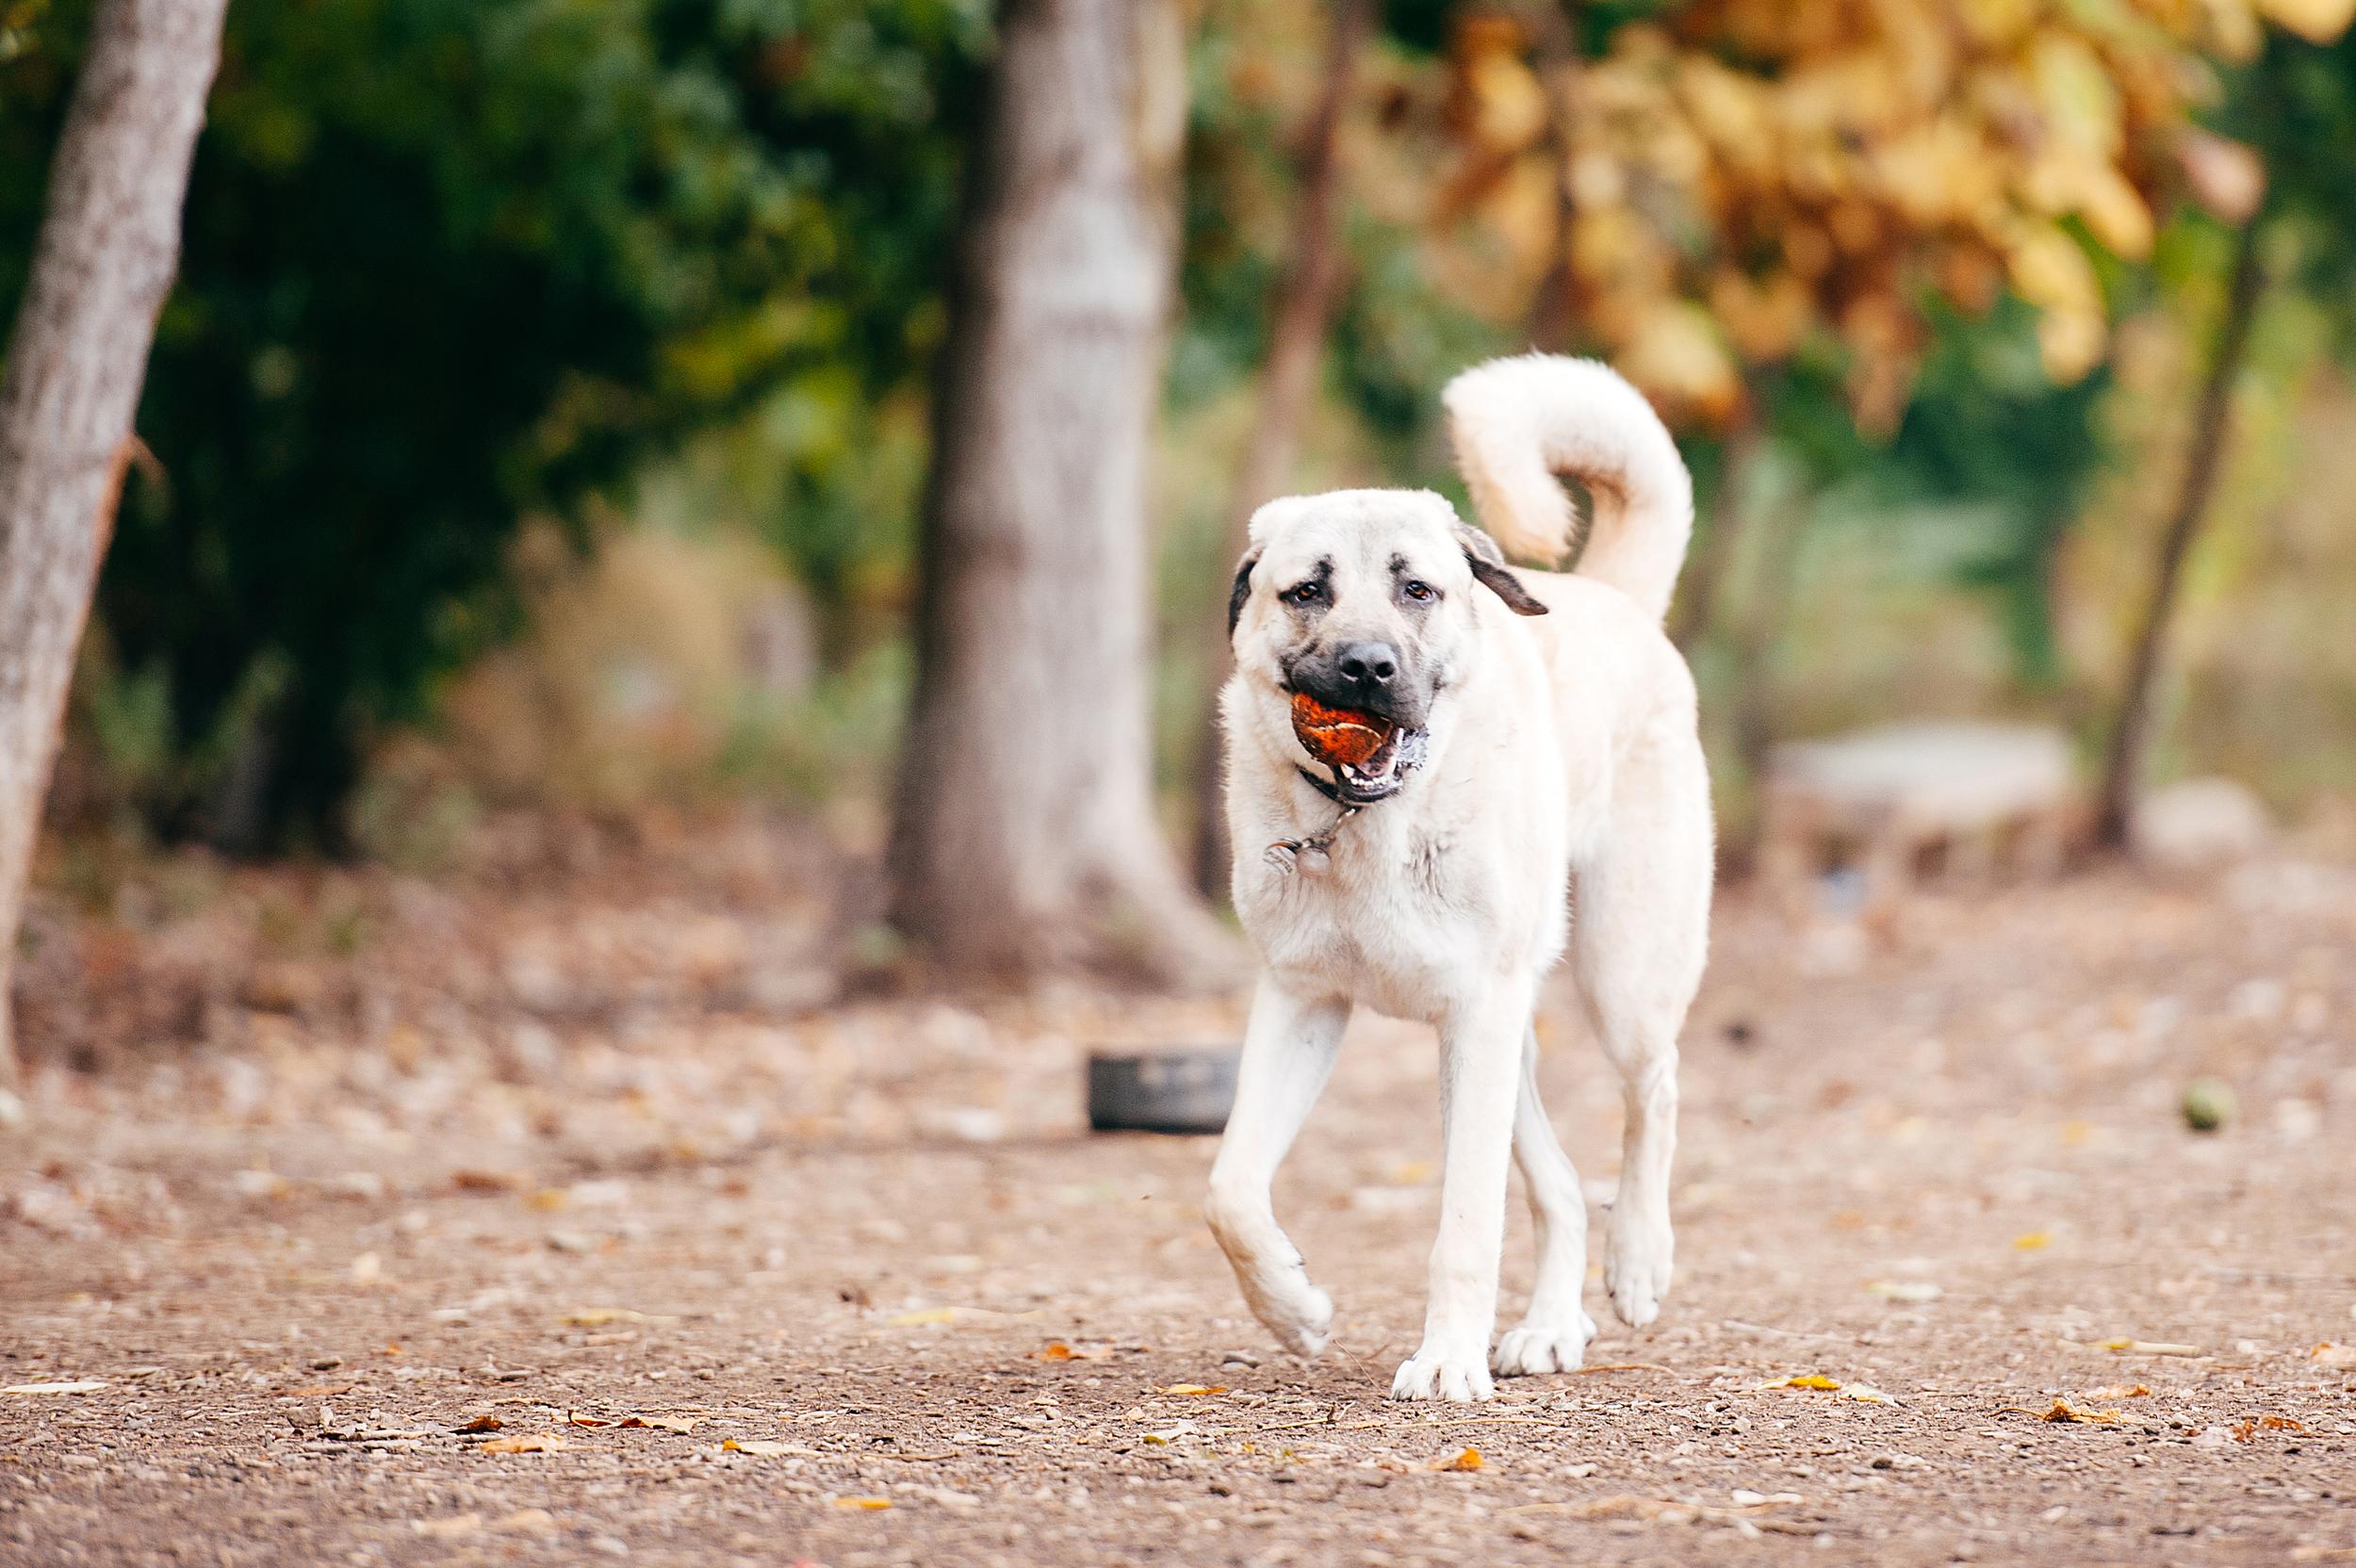 bernard-dog-run-pittsburgh-walsh05.jpg